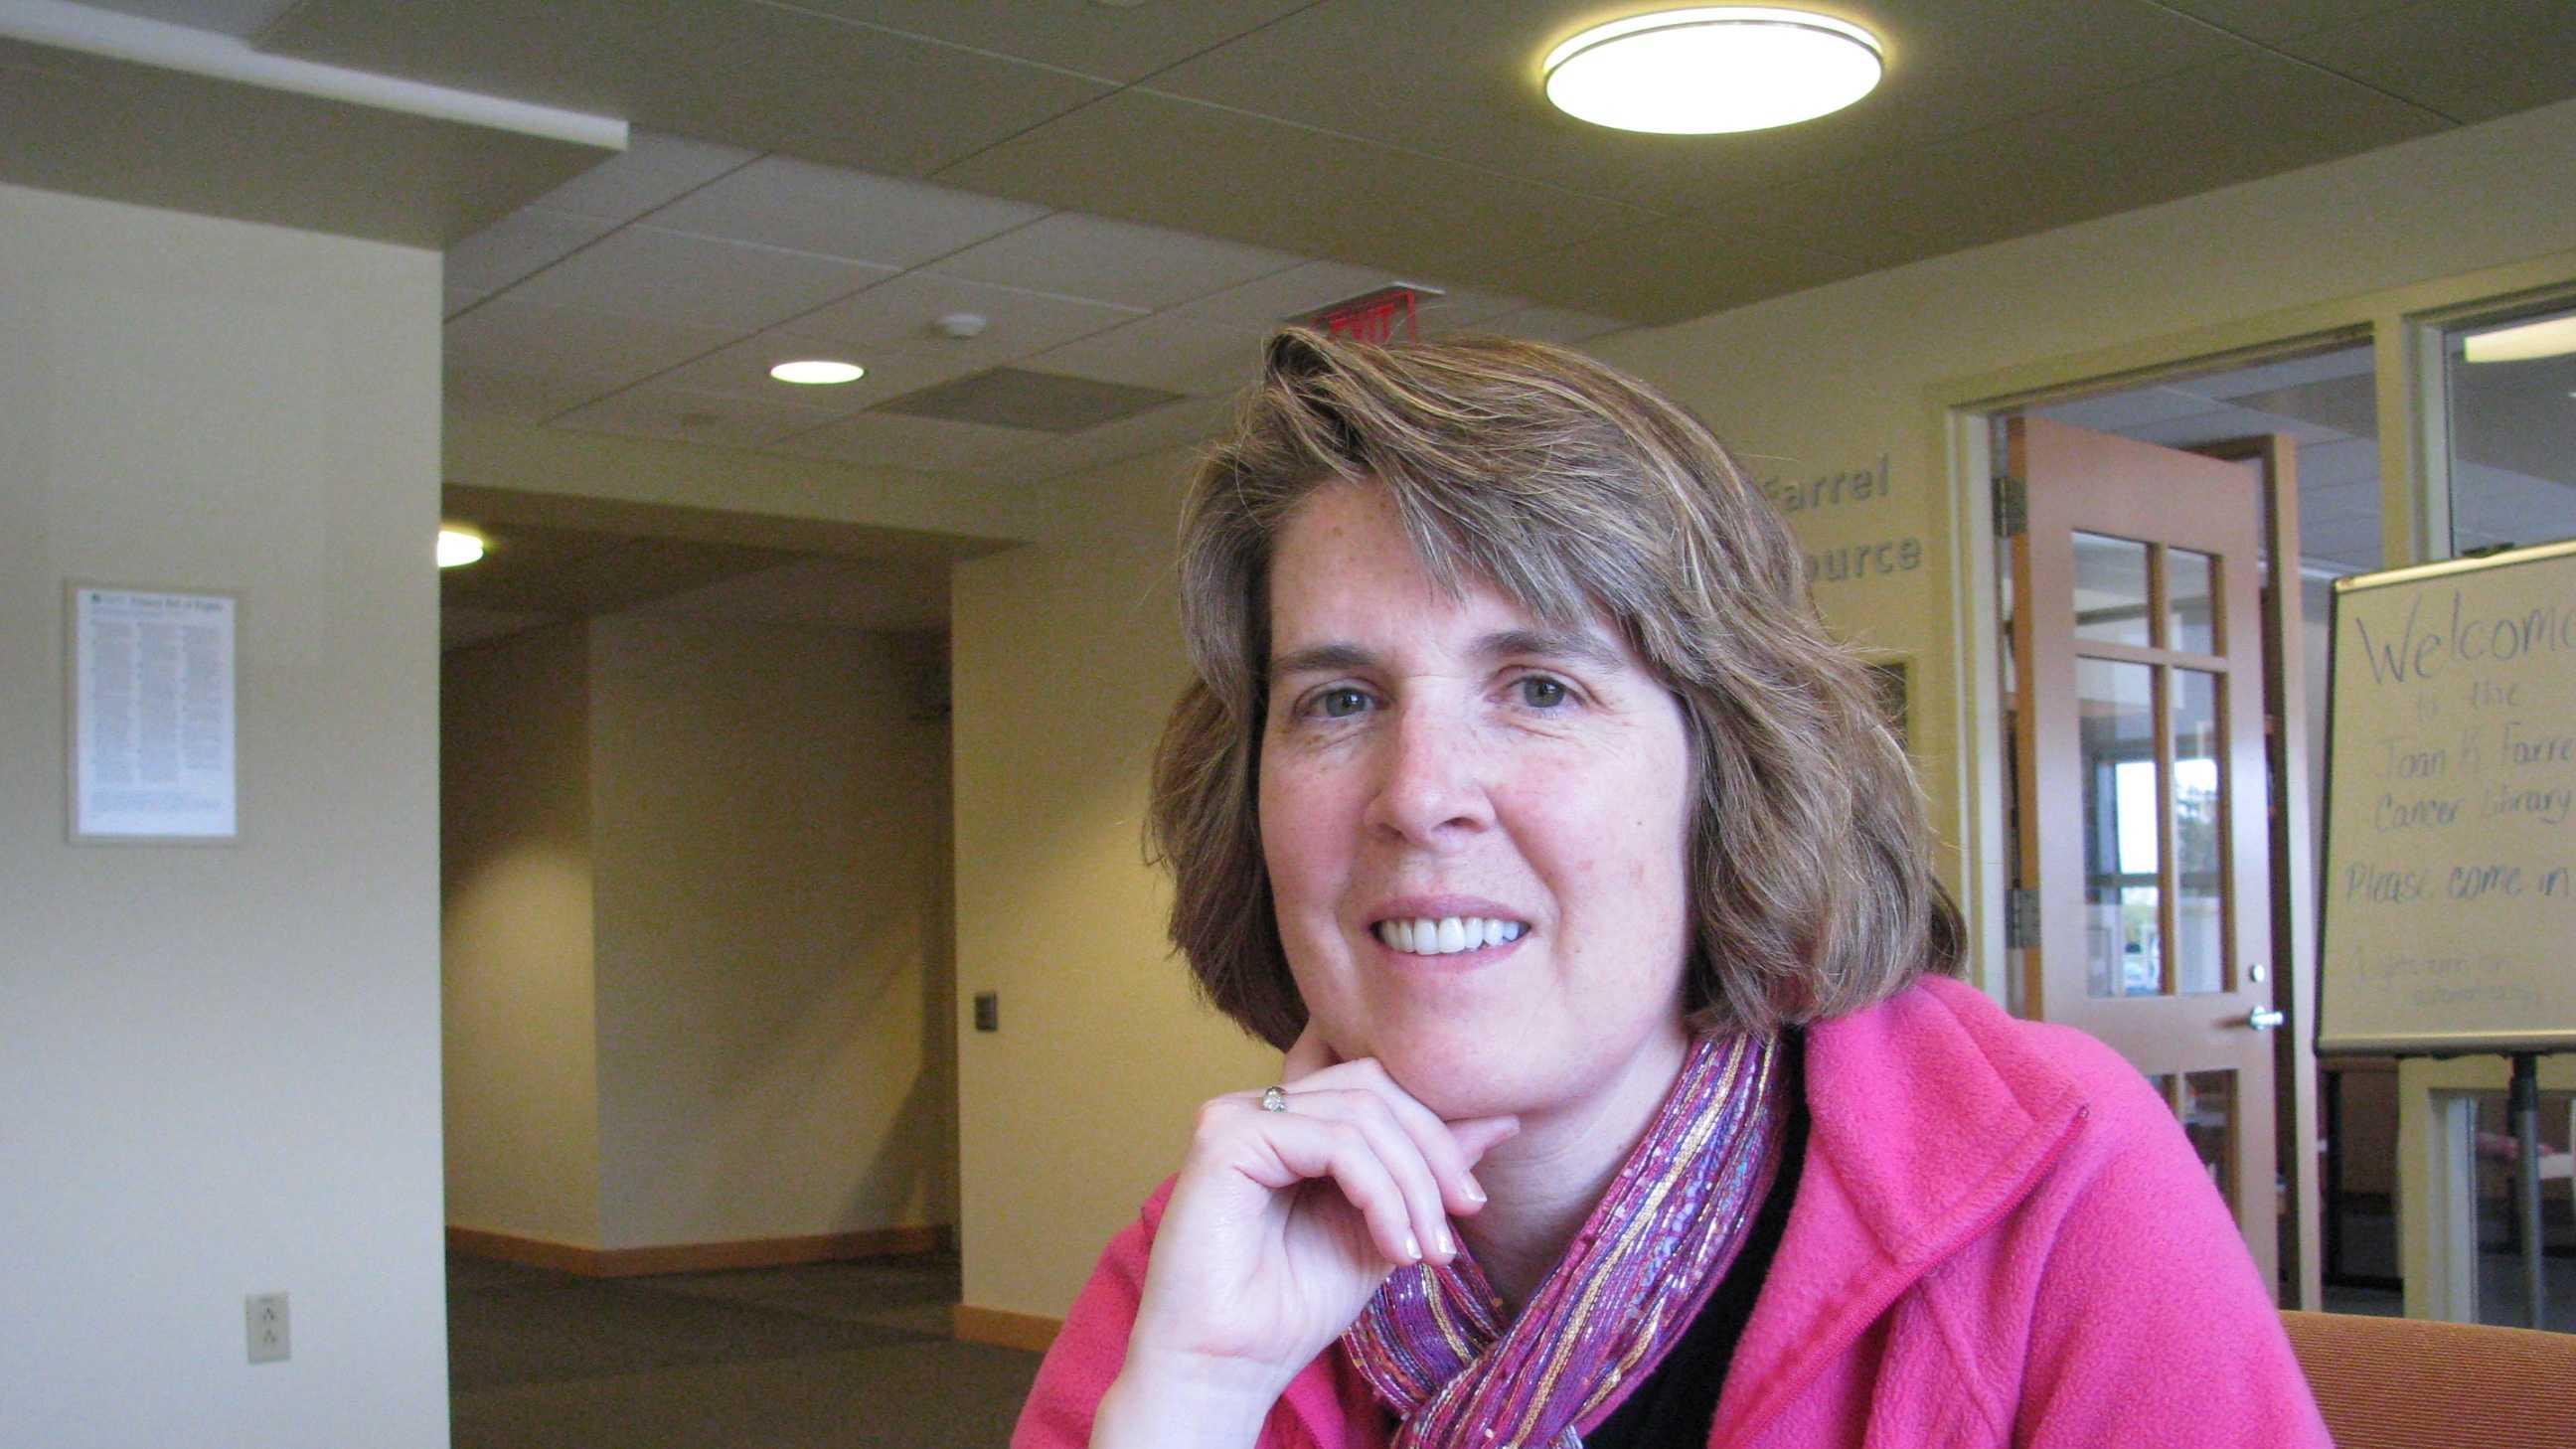 Stephanie Murdoch Riley at Concord Hospital's Payson Center for Cancer Care.